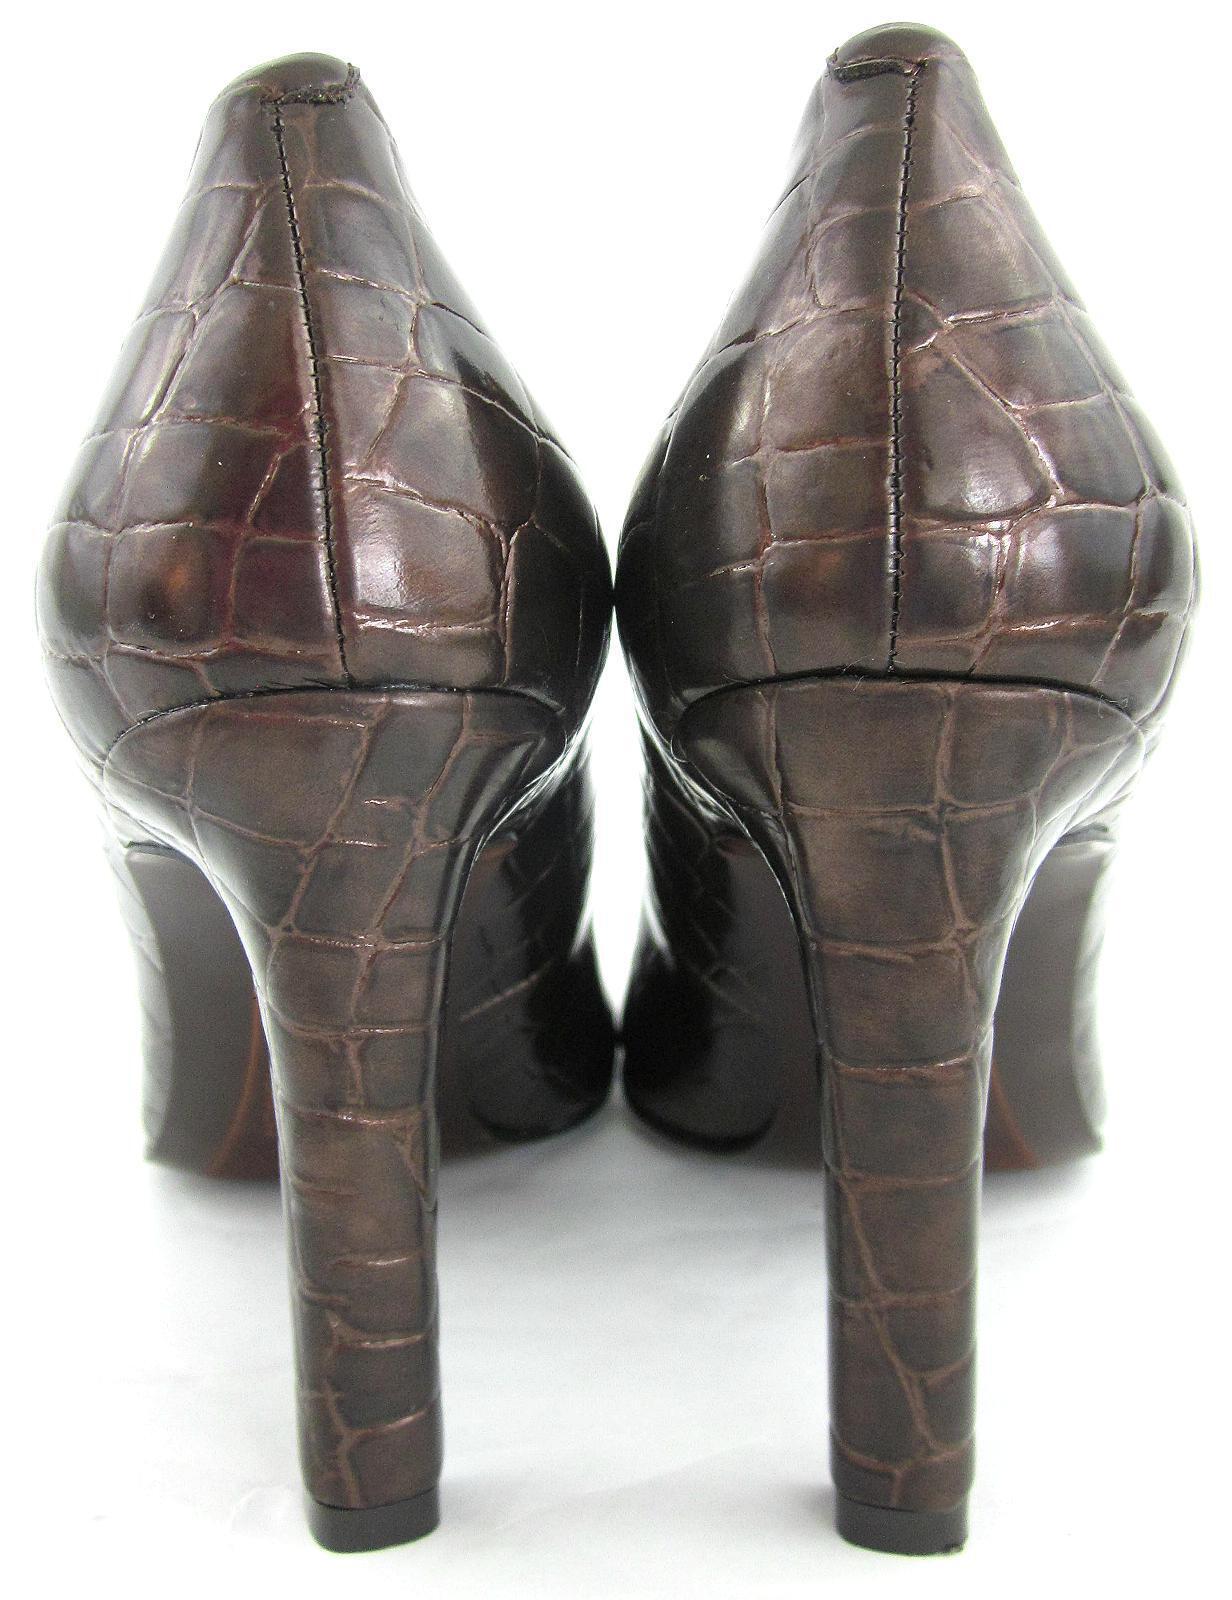 Classic Women's Sandals Tan Gino Ventori Heels Reward Heels